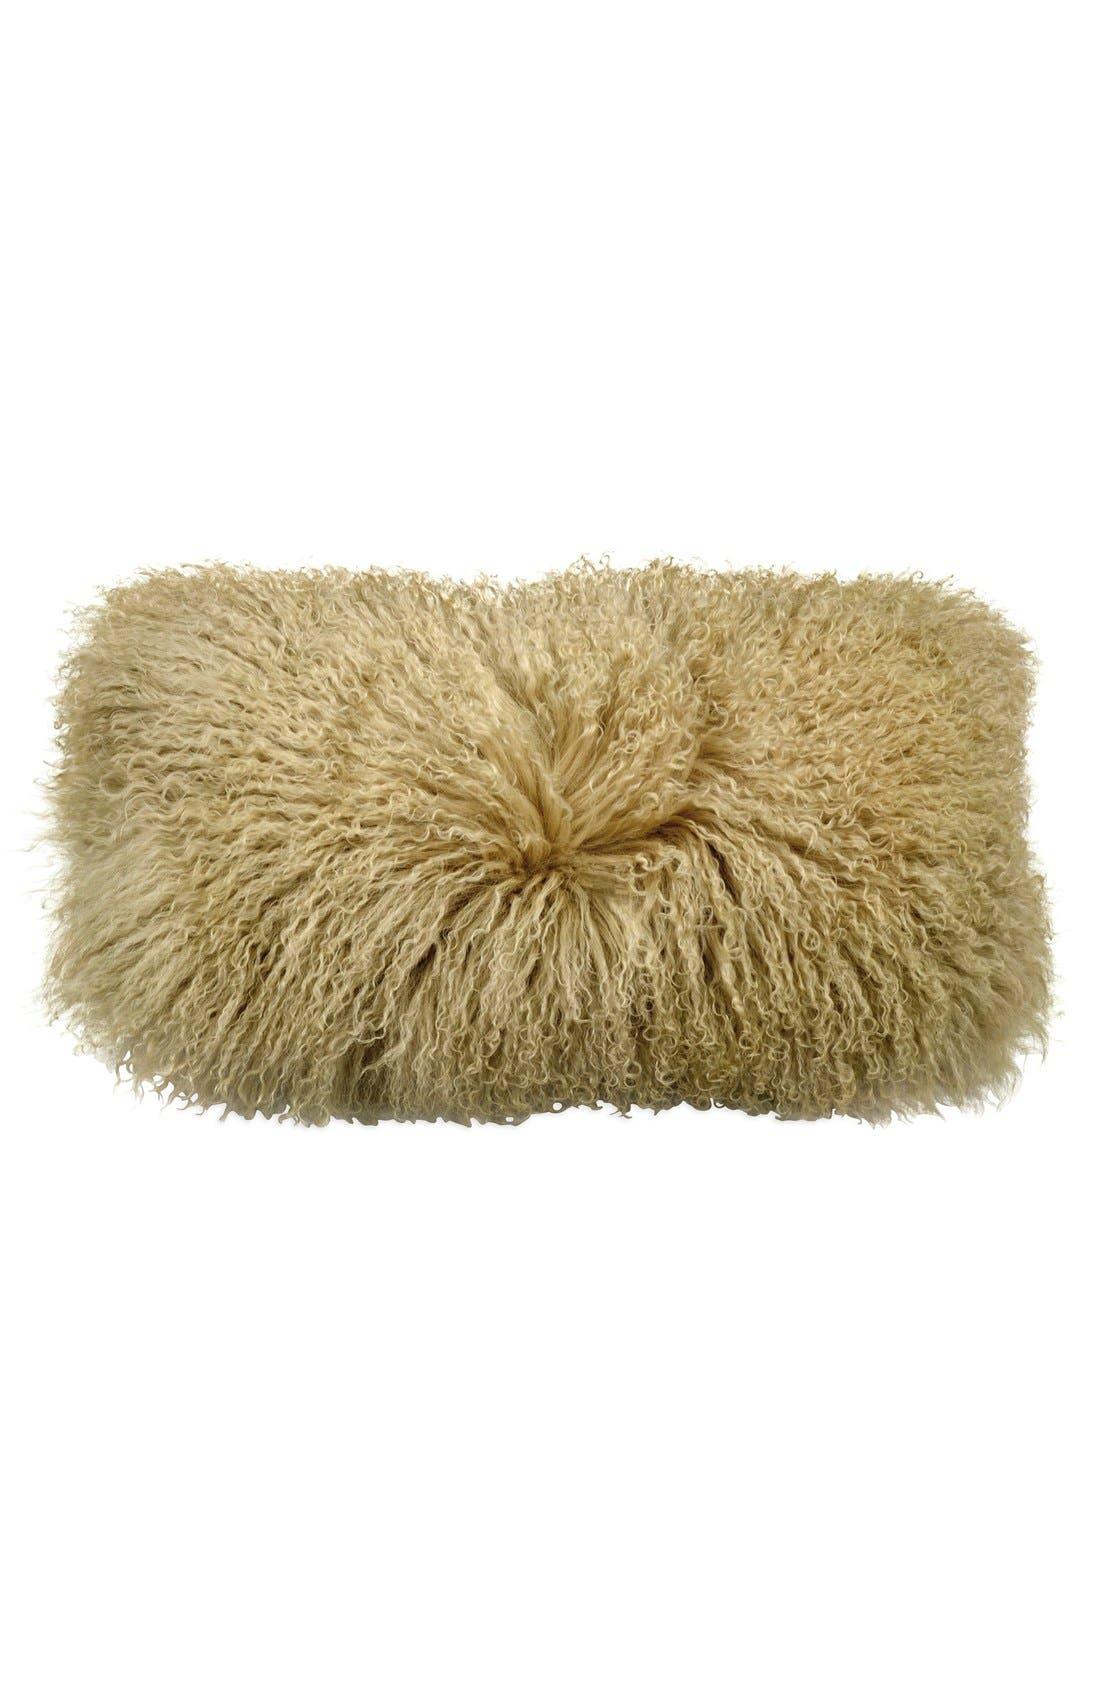 Flokati Genuine Shearling Pillow,                             Main thumbnail 1, color,                             Gold Dust